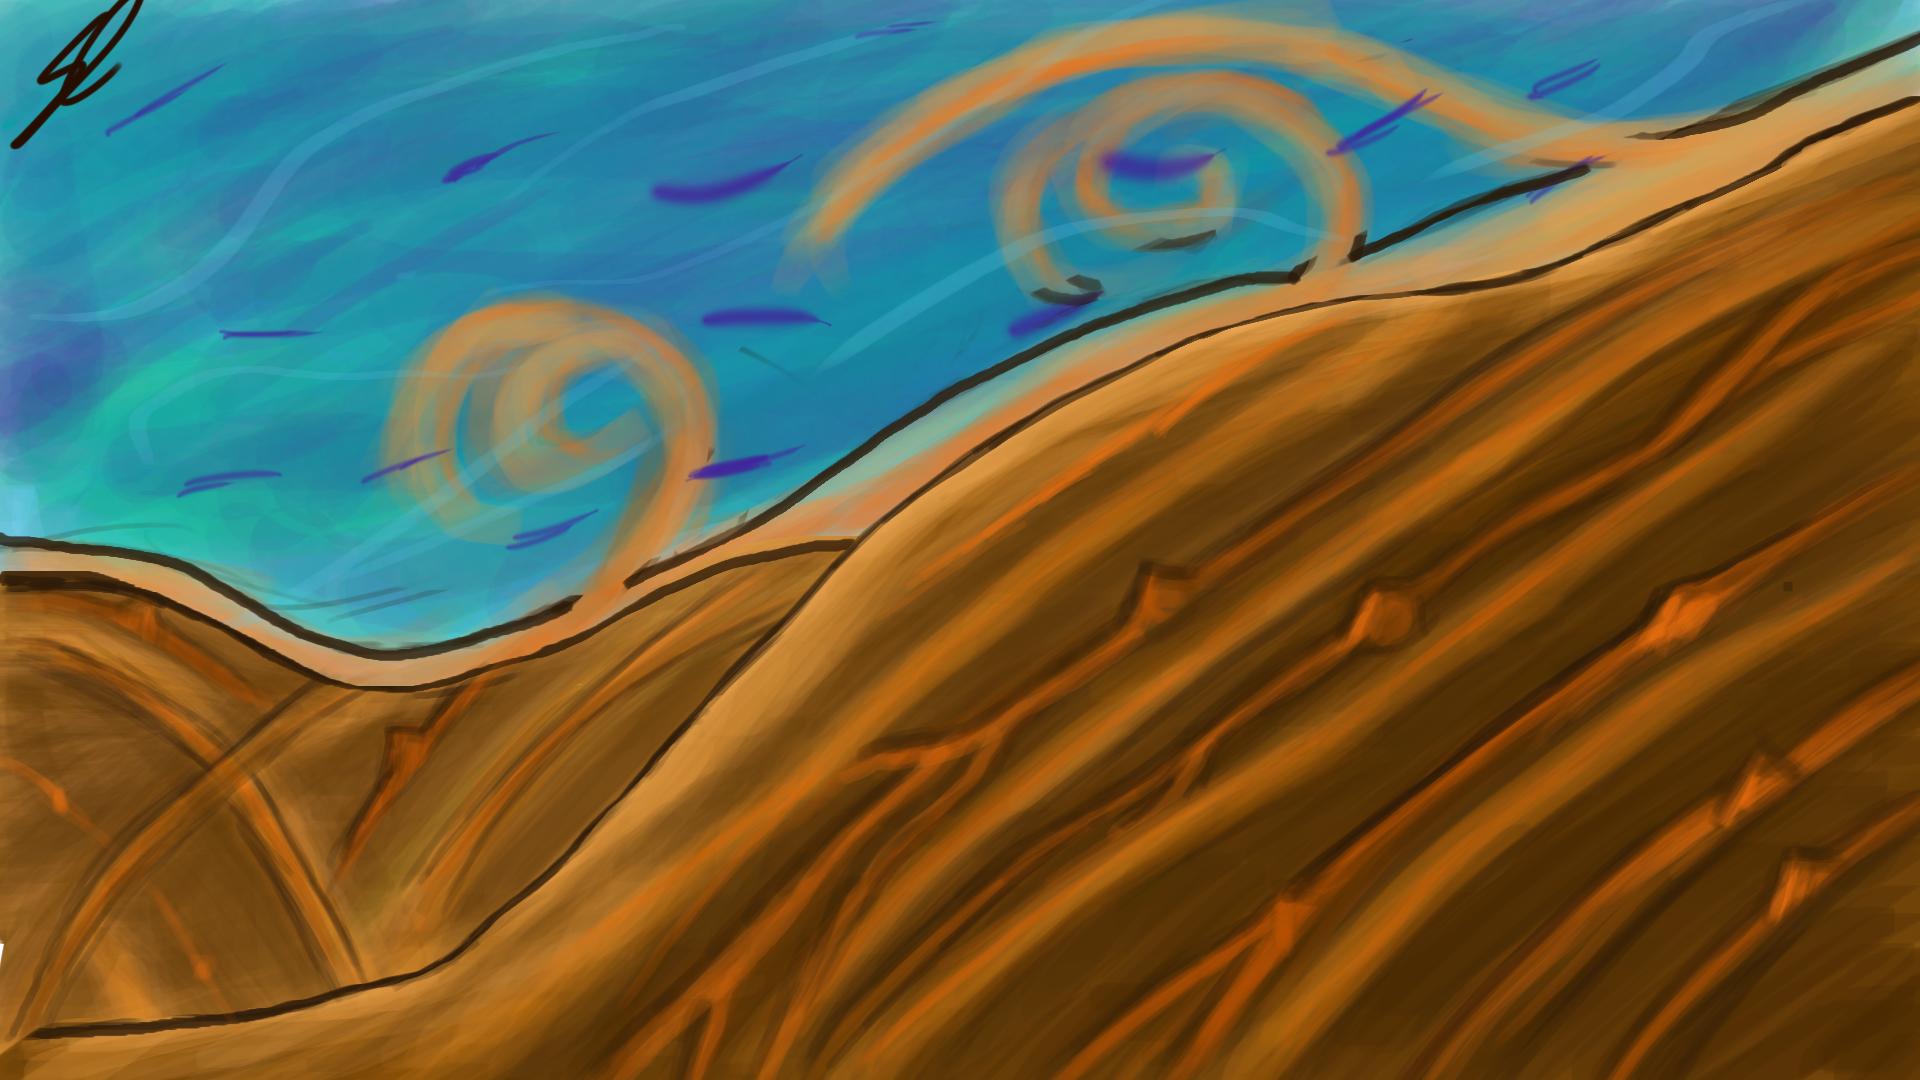 Ore in the Desert by Freeman1600